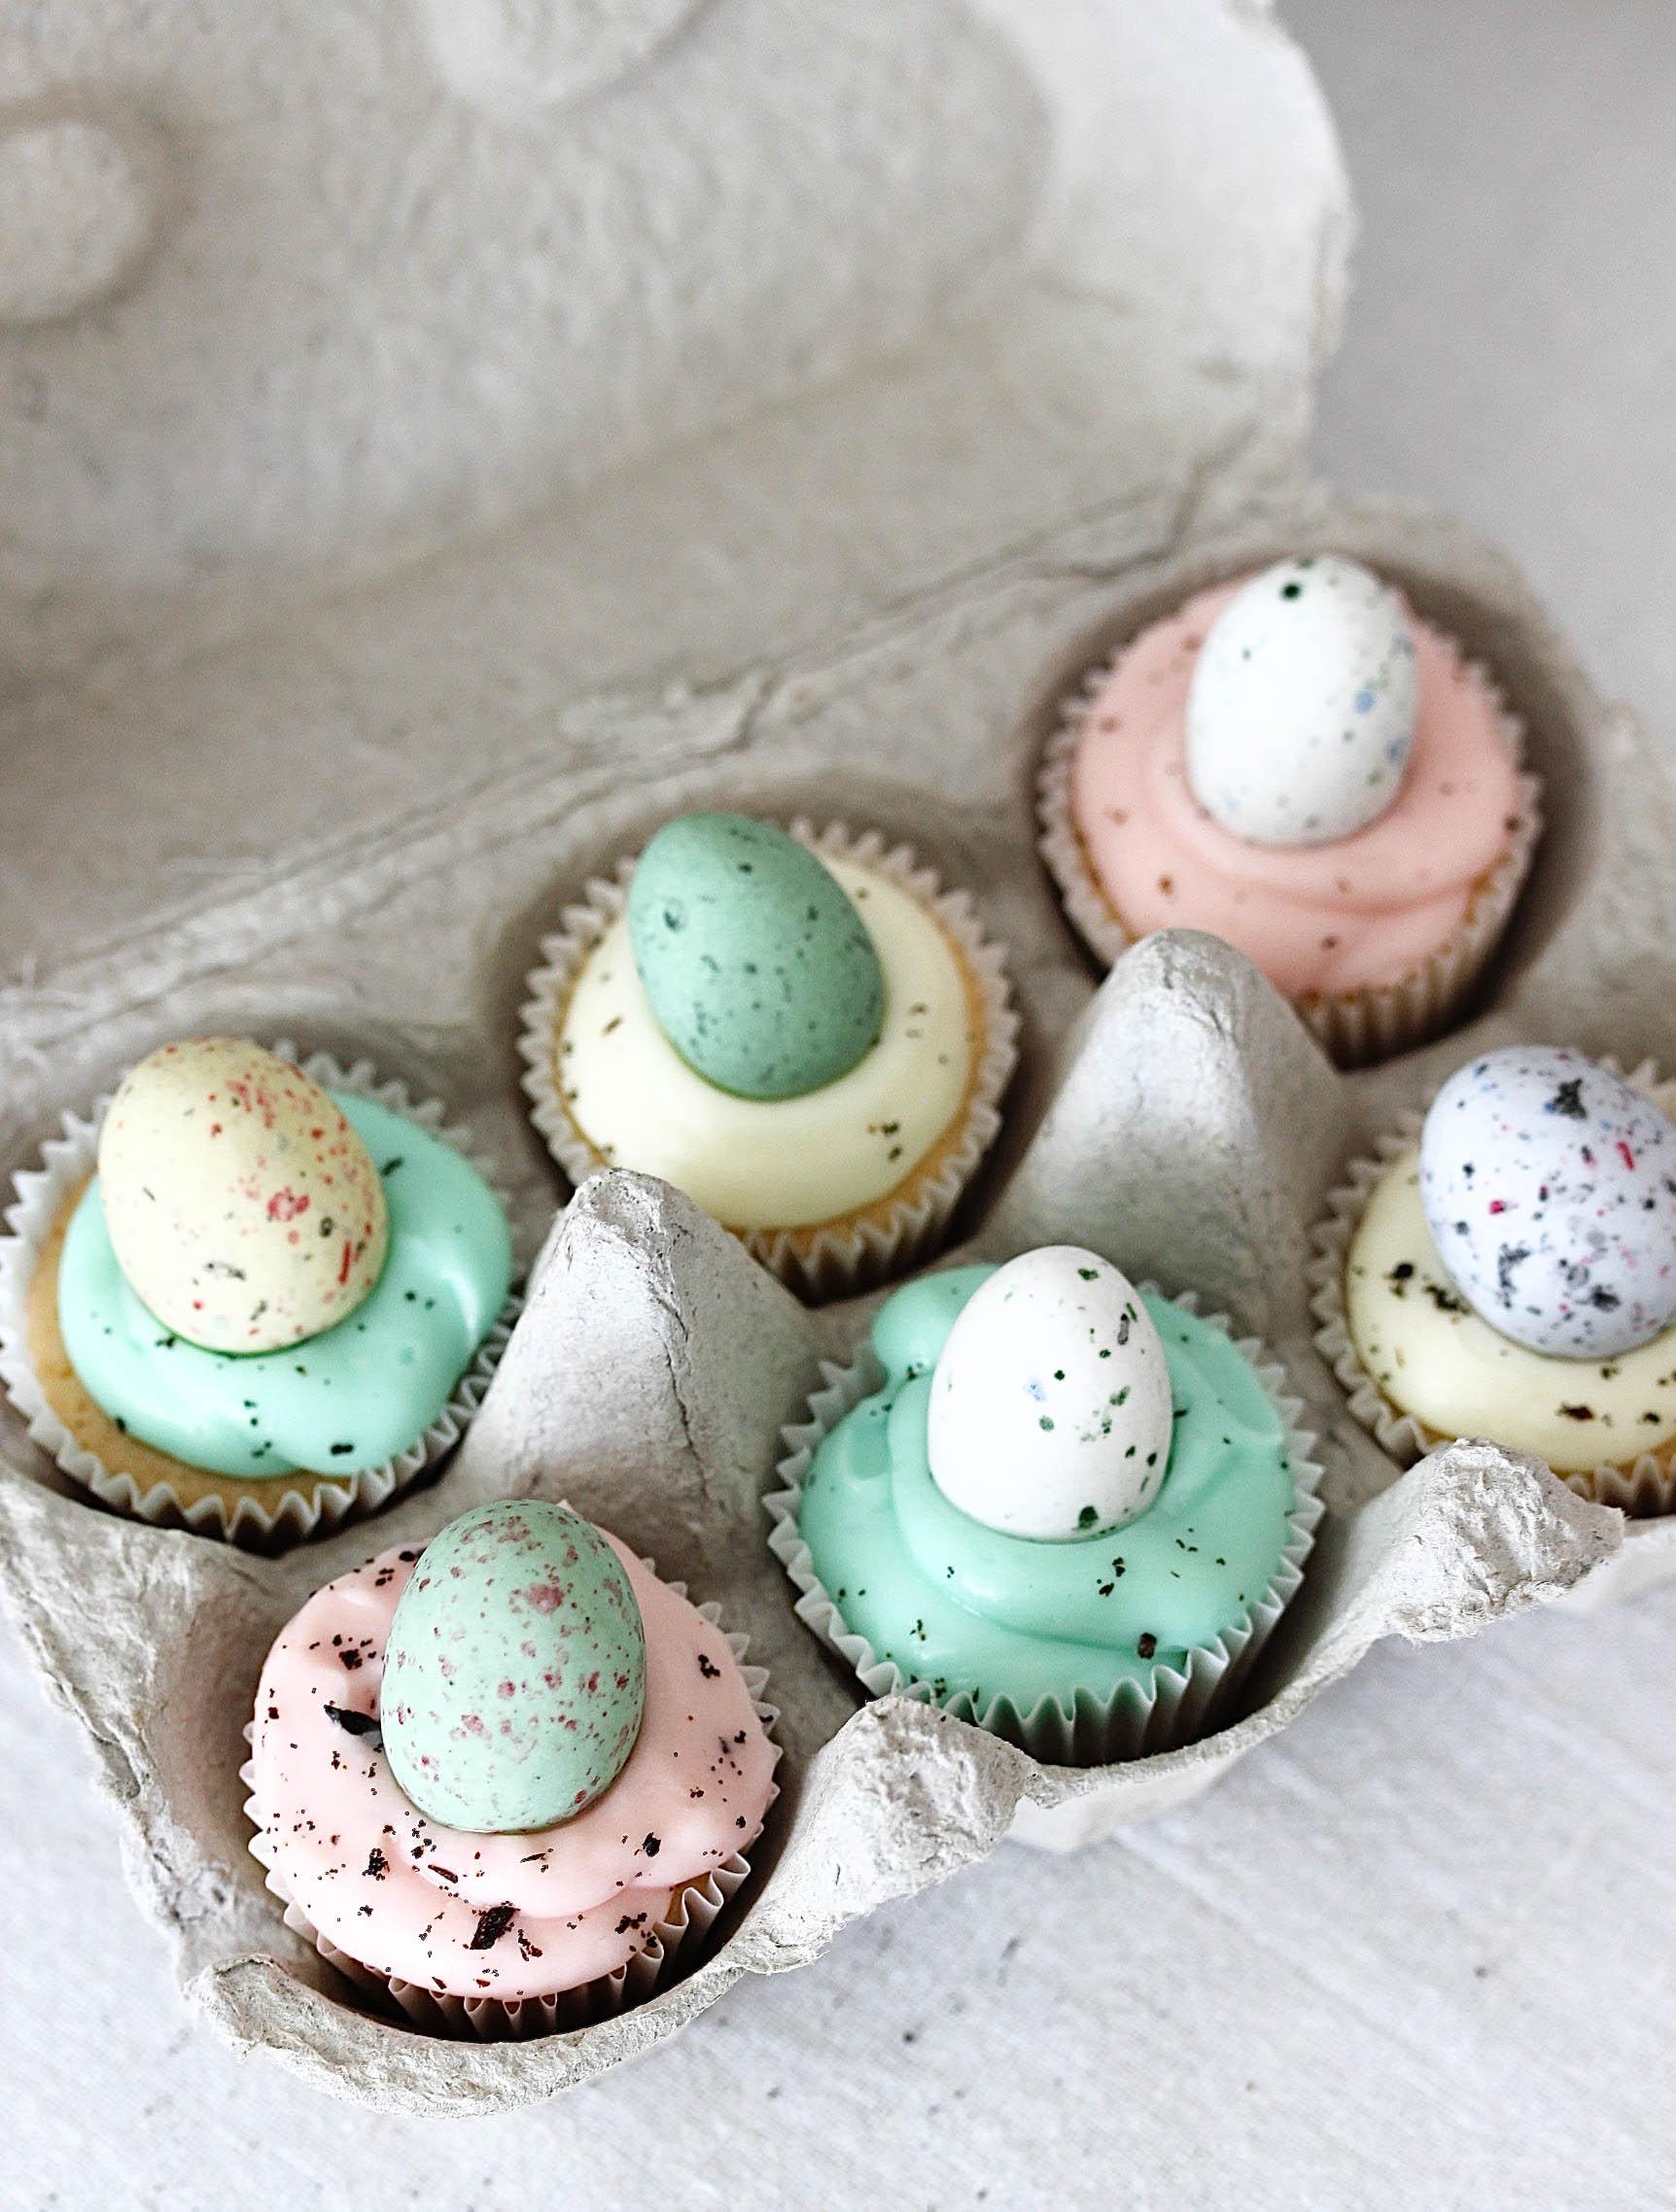 Rezept: Gesprenkelte Mini Oster Cupcakes in Eierschachtel backen Ostern #ostern #cupcakes #mini #vanille #easter | Emma´s Lieblingsstücke